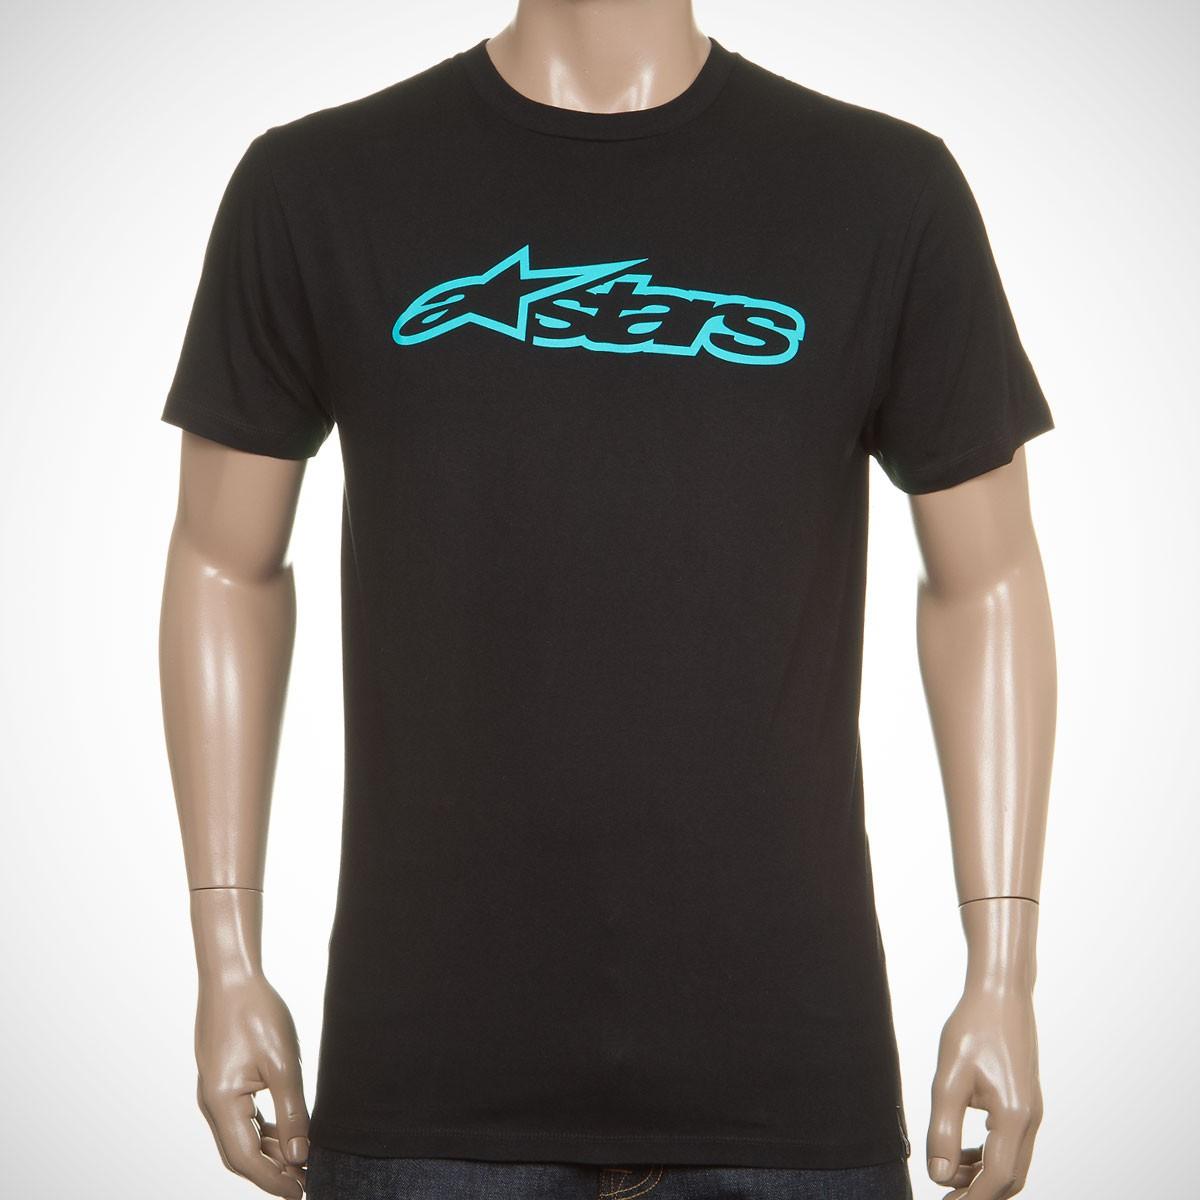 Camiseta Alpinestars Blaze Classic Tee (Black Aqua)  - Super Bike - Loja Oficial Alpinestars